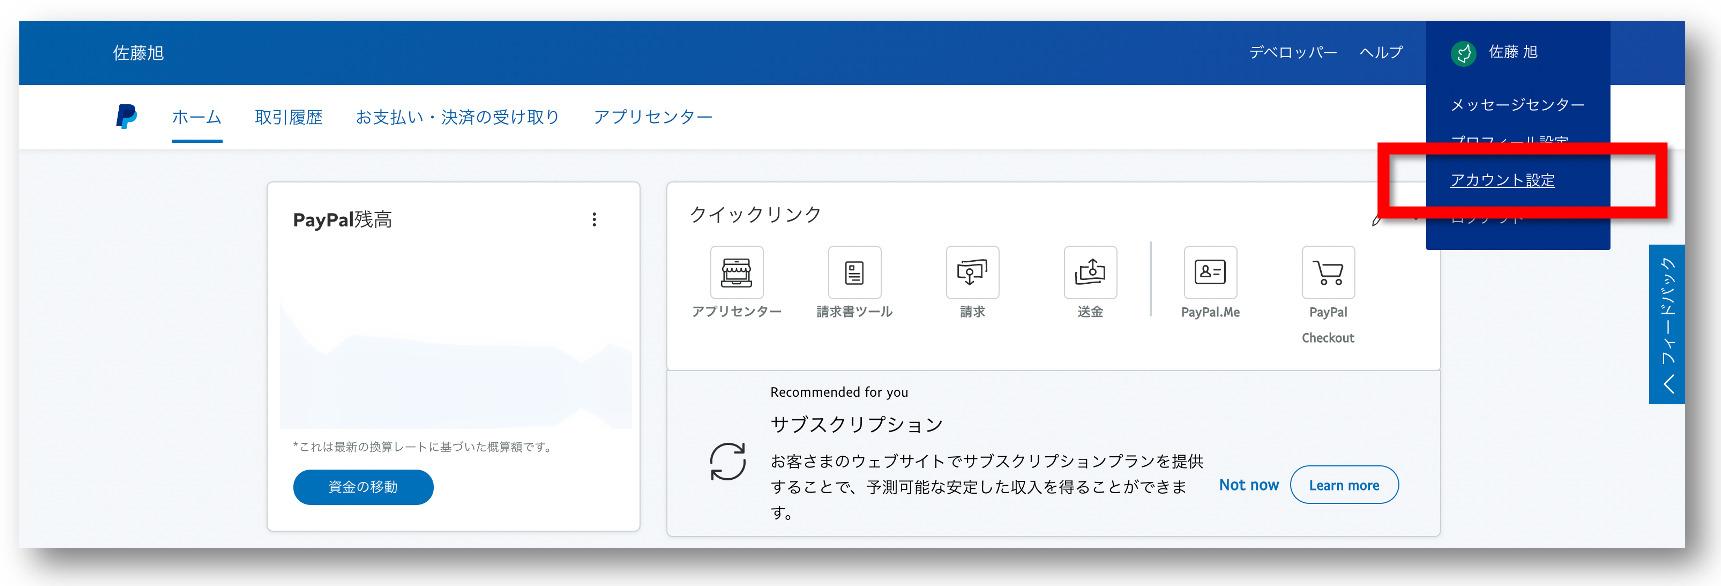 PayPal定期購読の停止手順